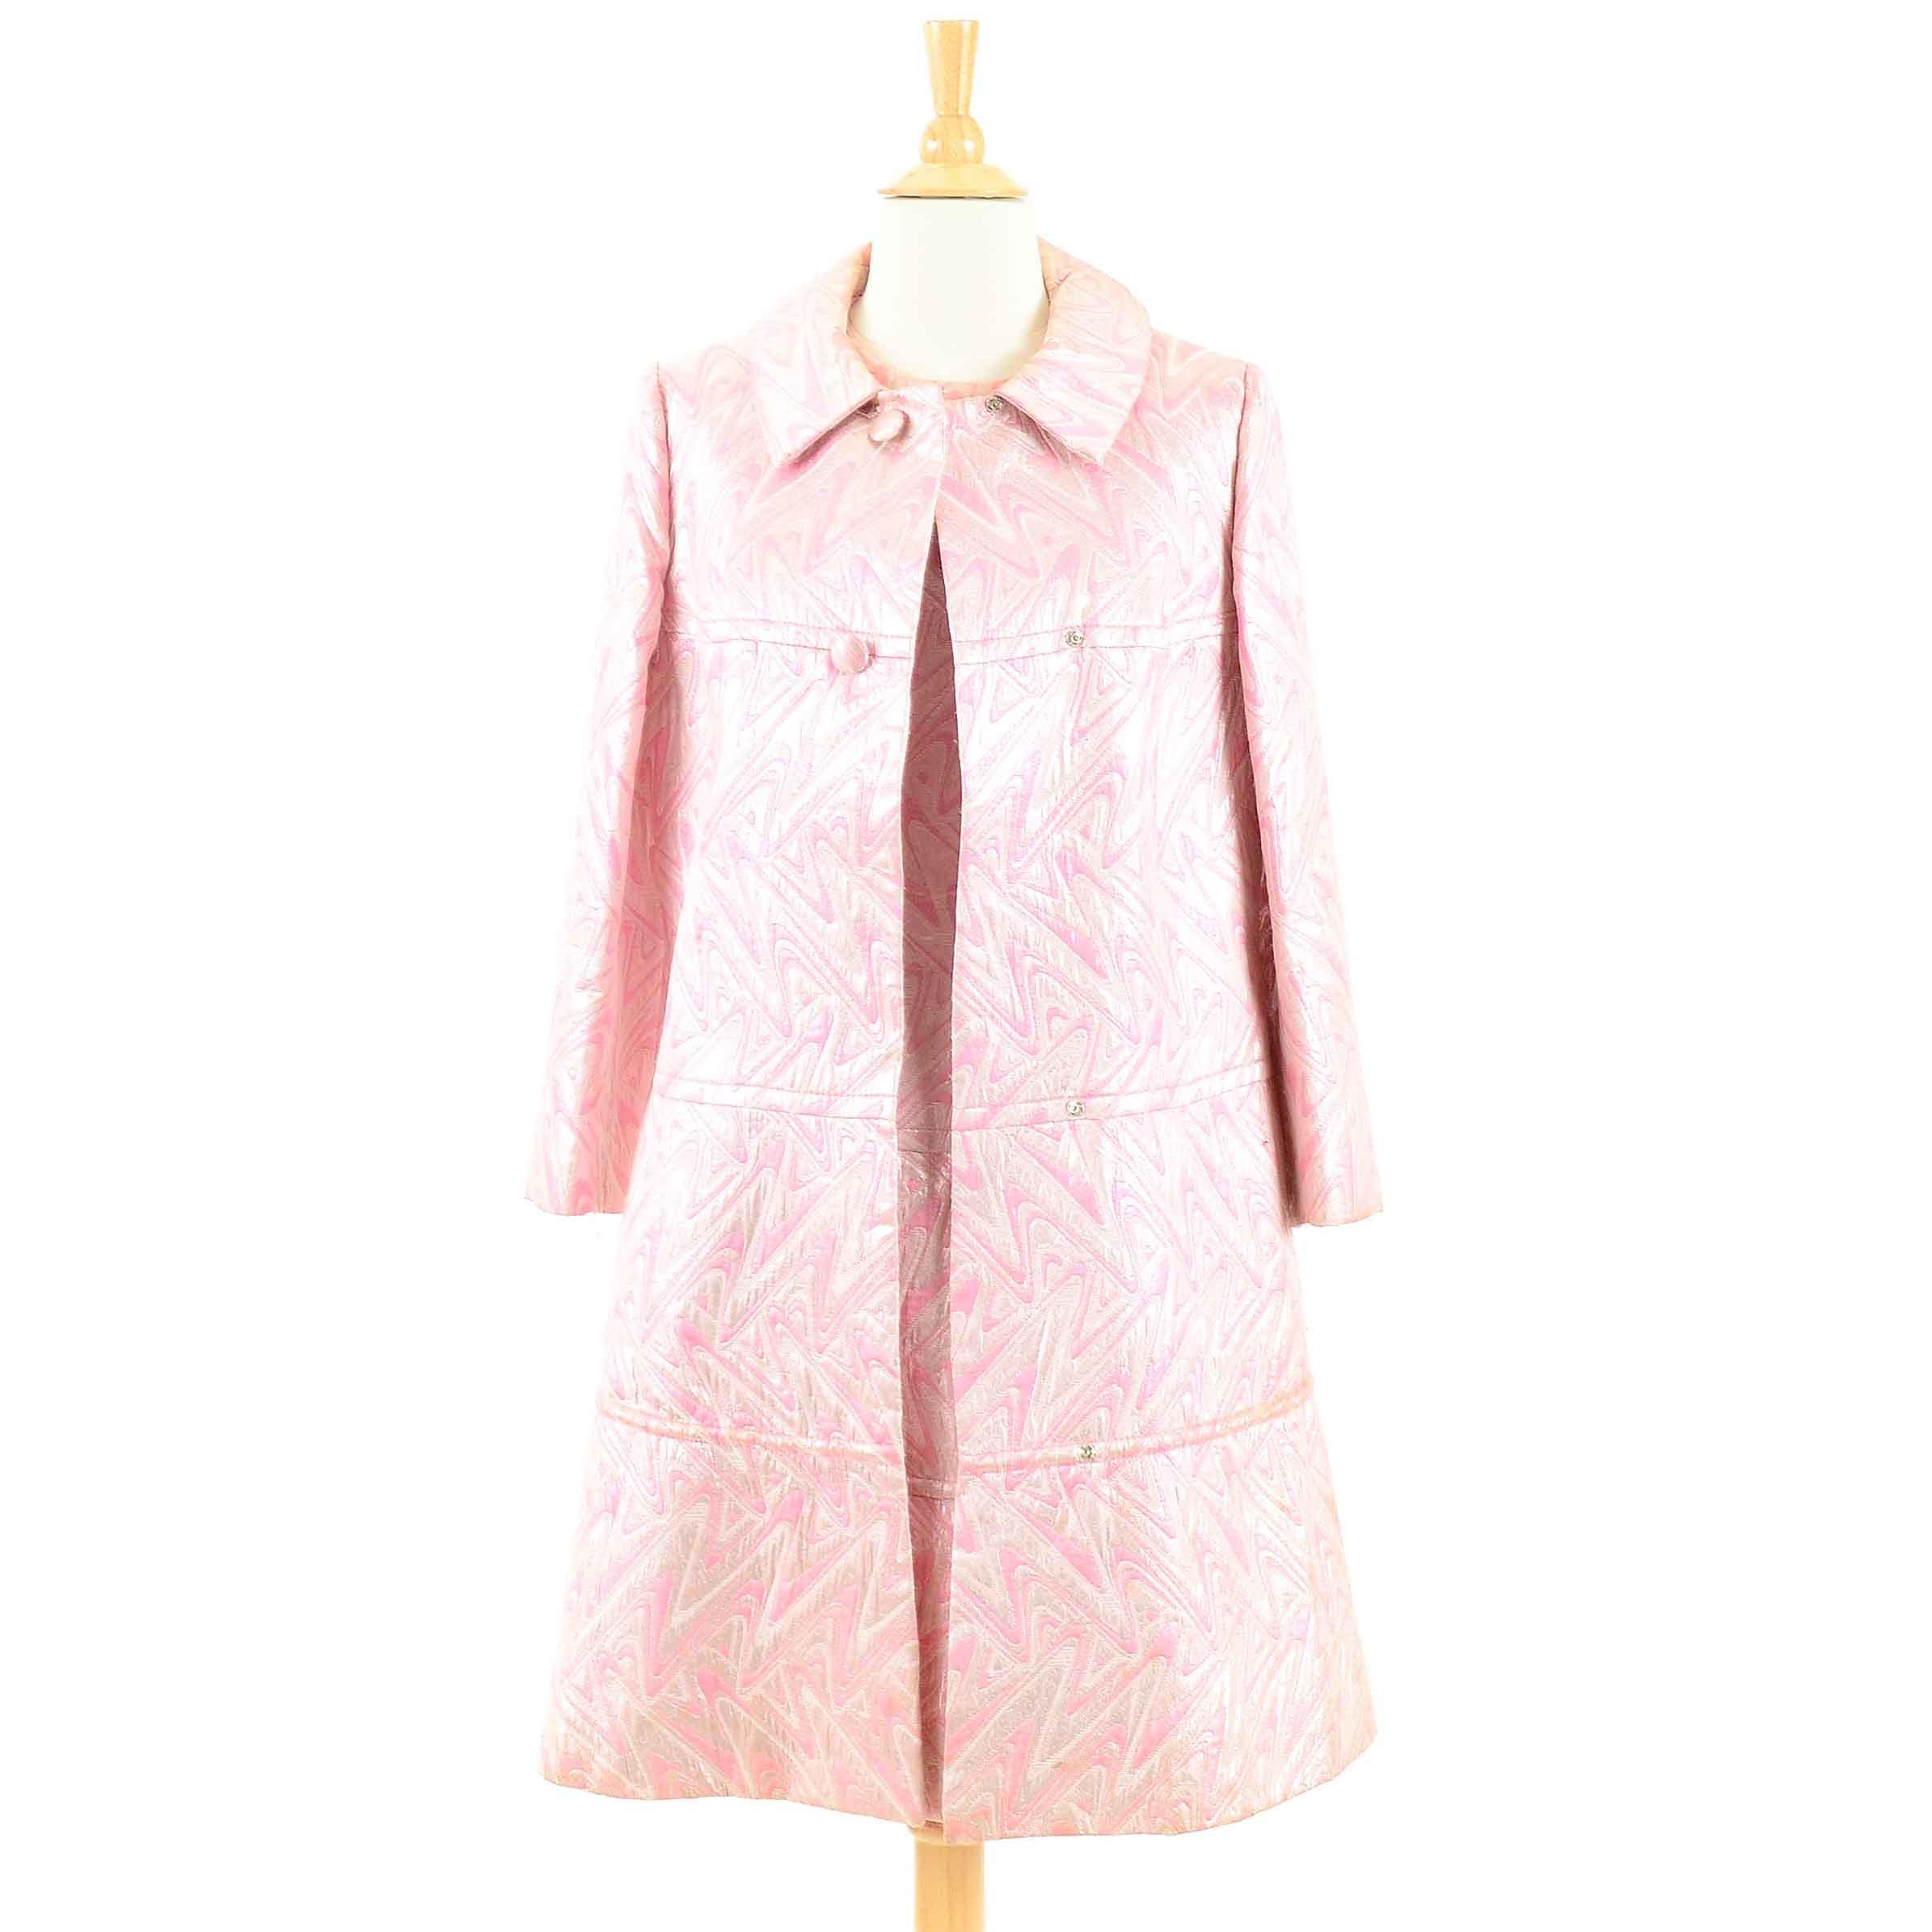 Mid Century Mod Brocade Jacket and Dress